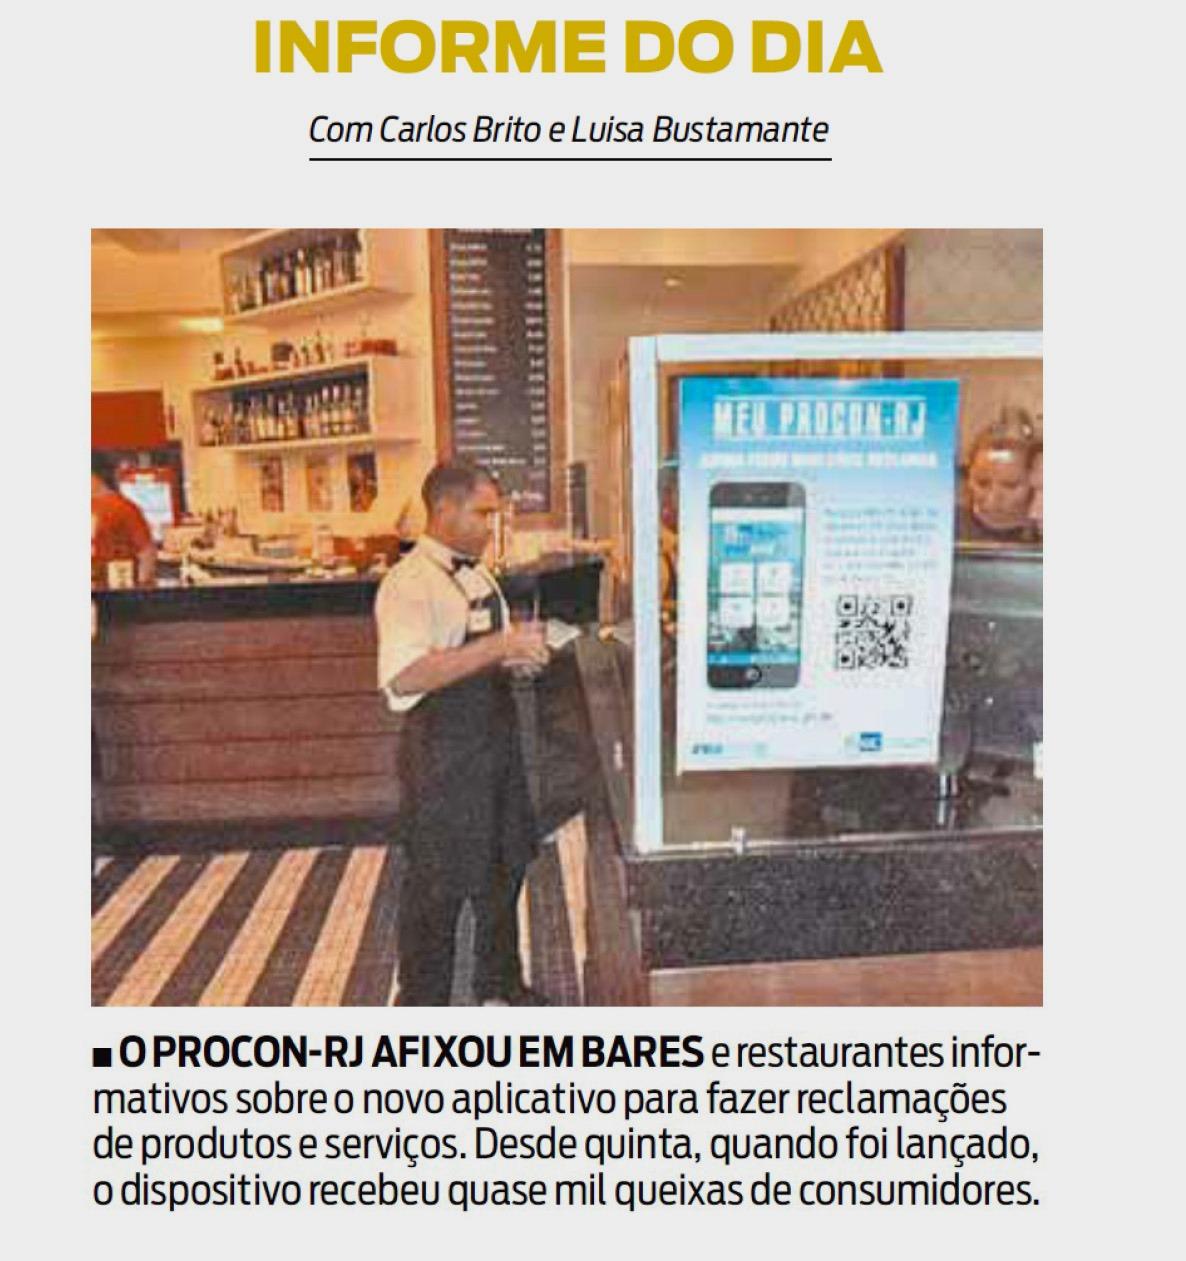 nota_procon_informe_o_dia_1396460351.78.jpg